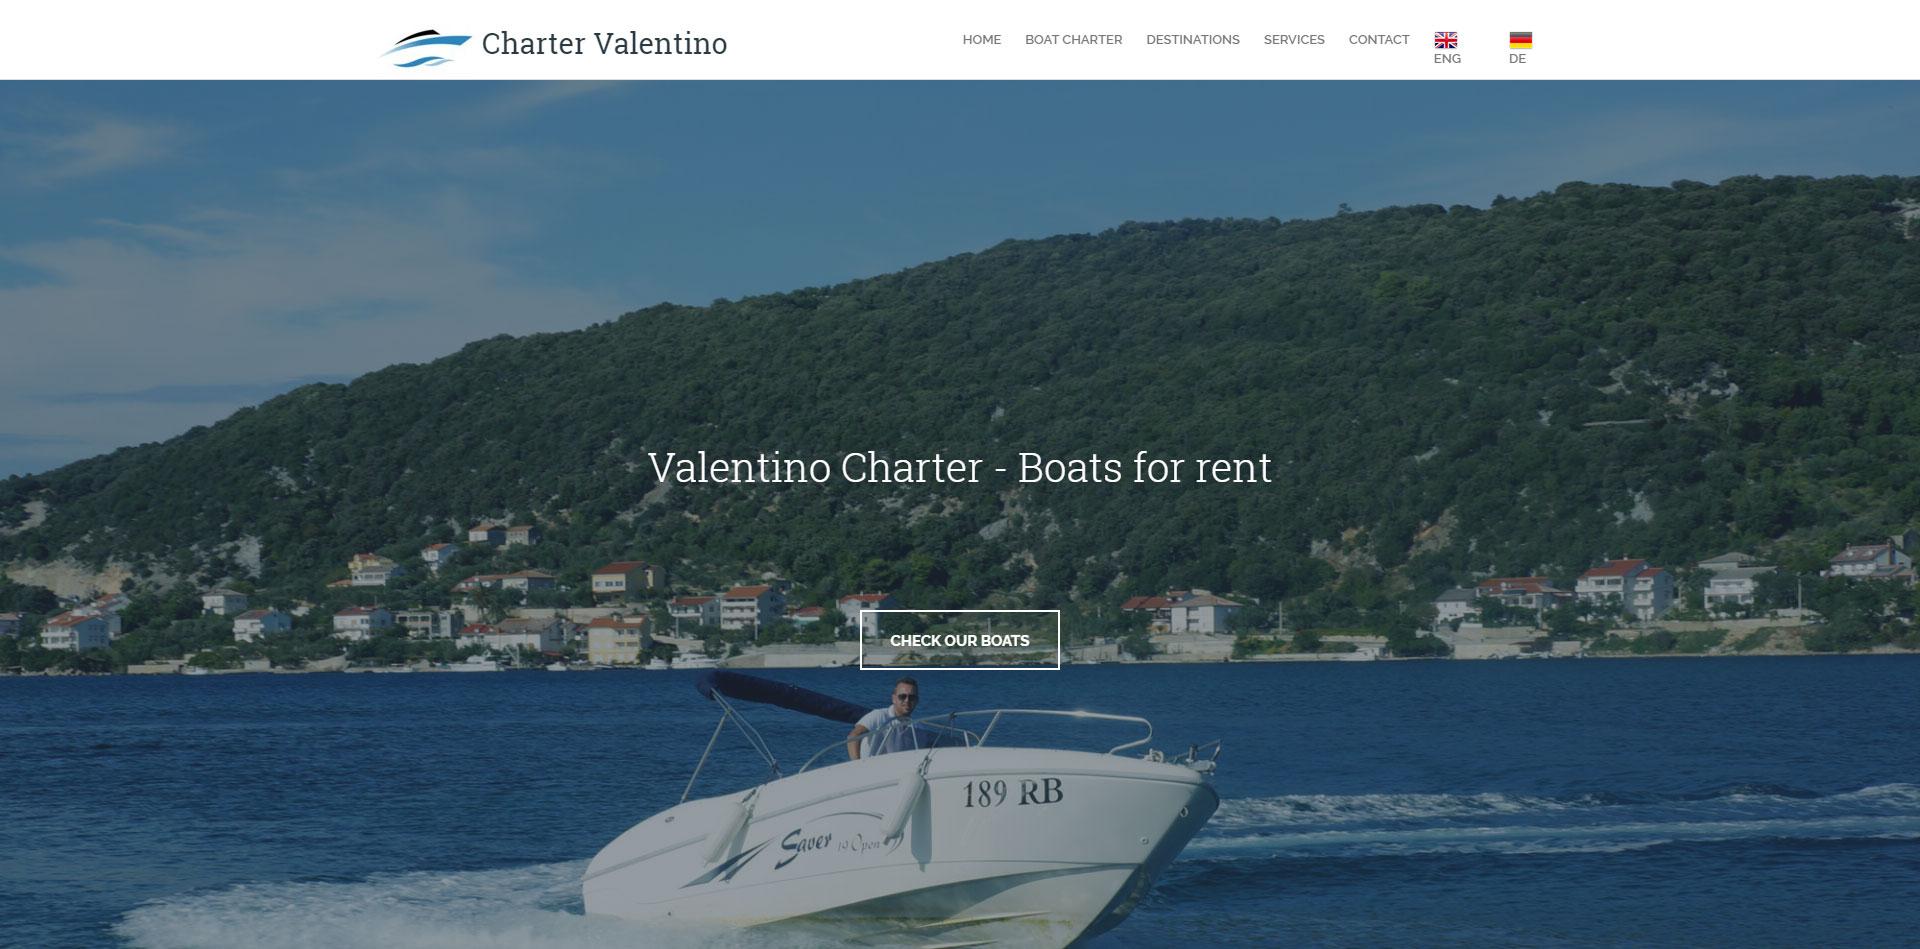 Valentino Charter - http://valentino-charter.com/